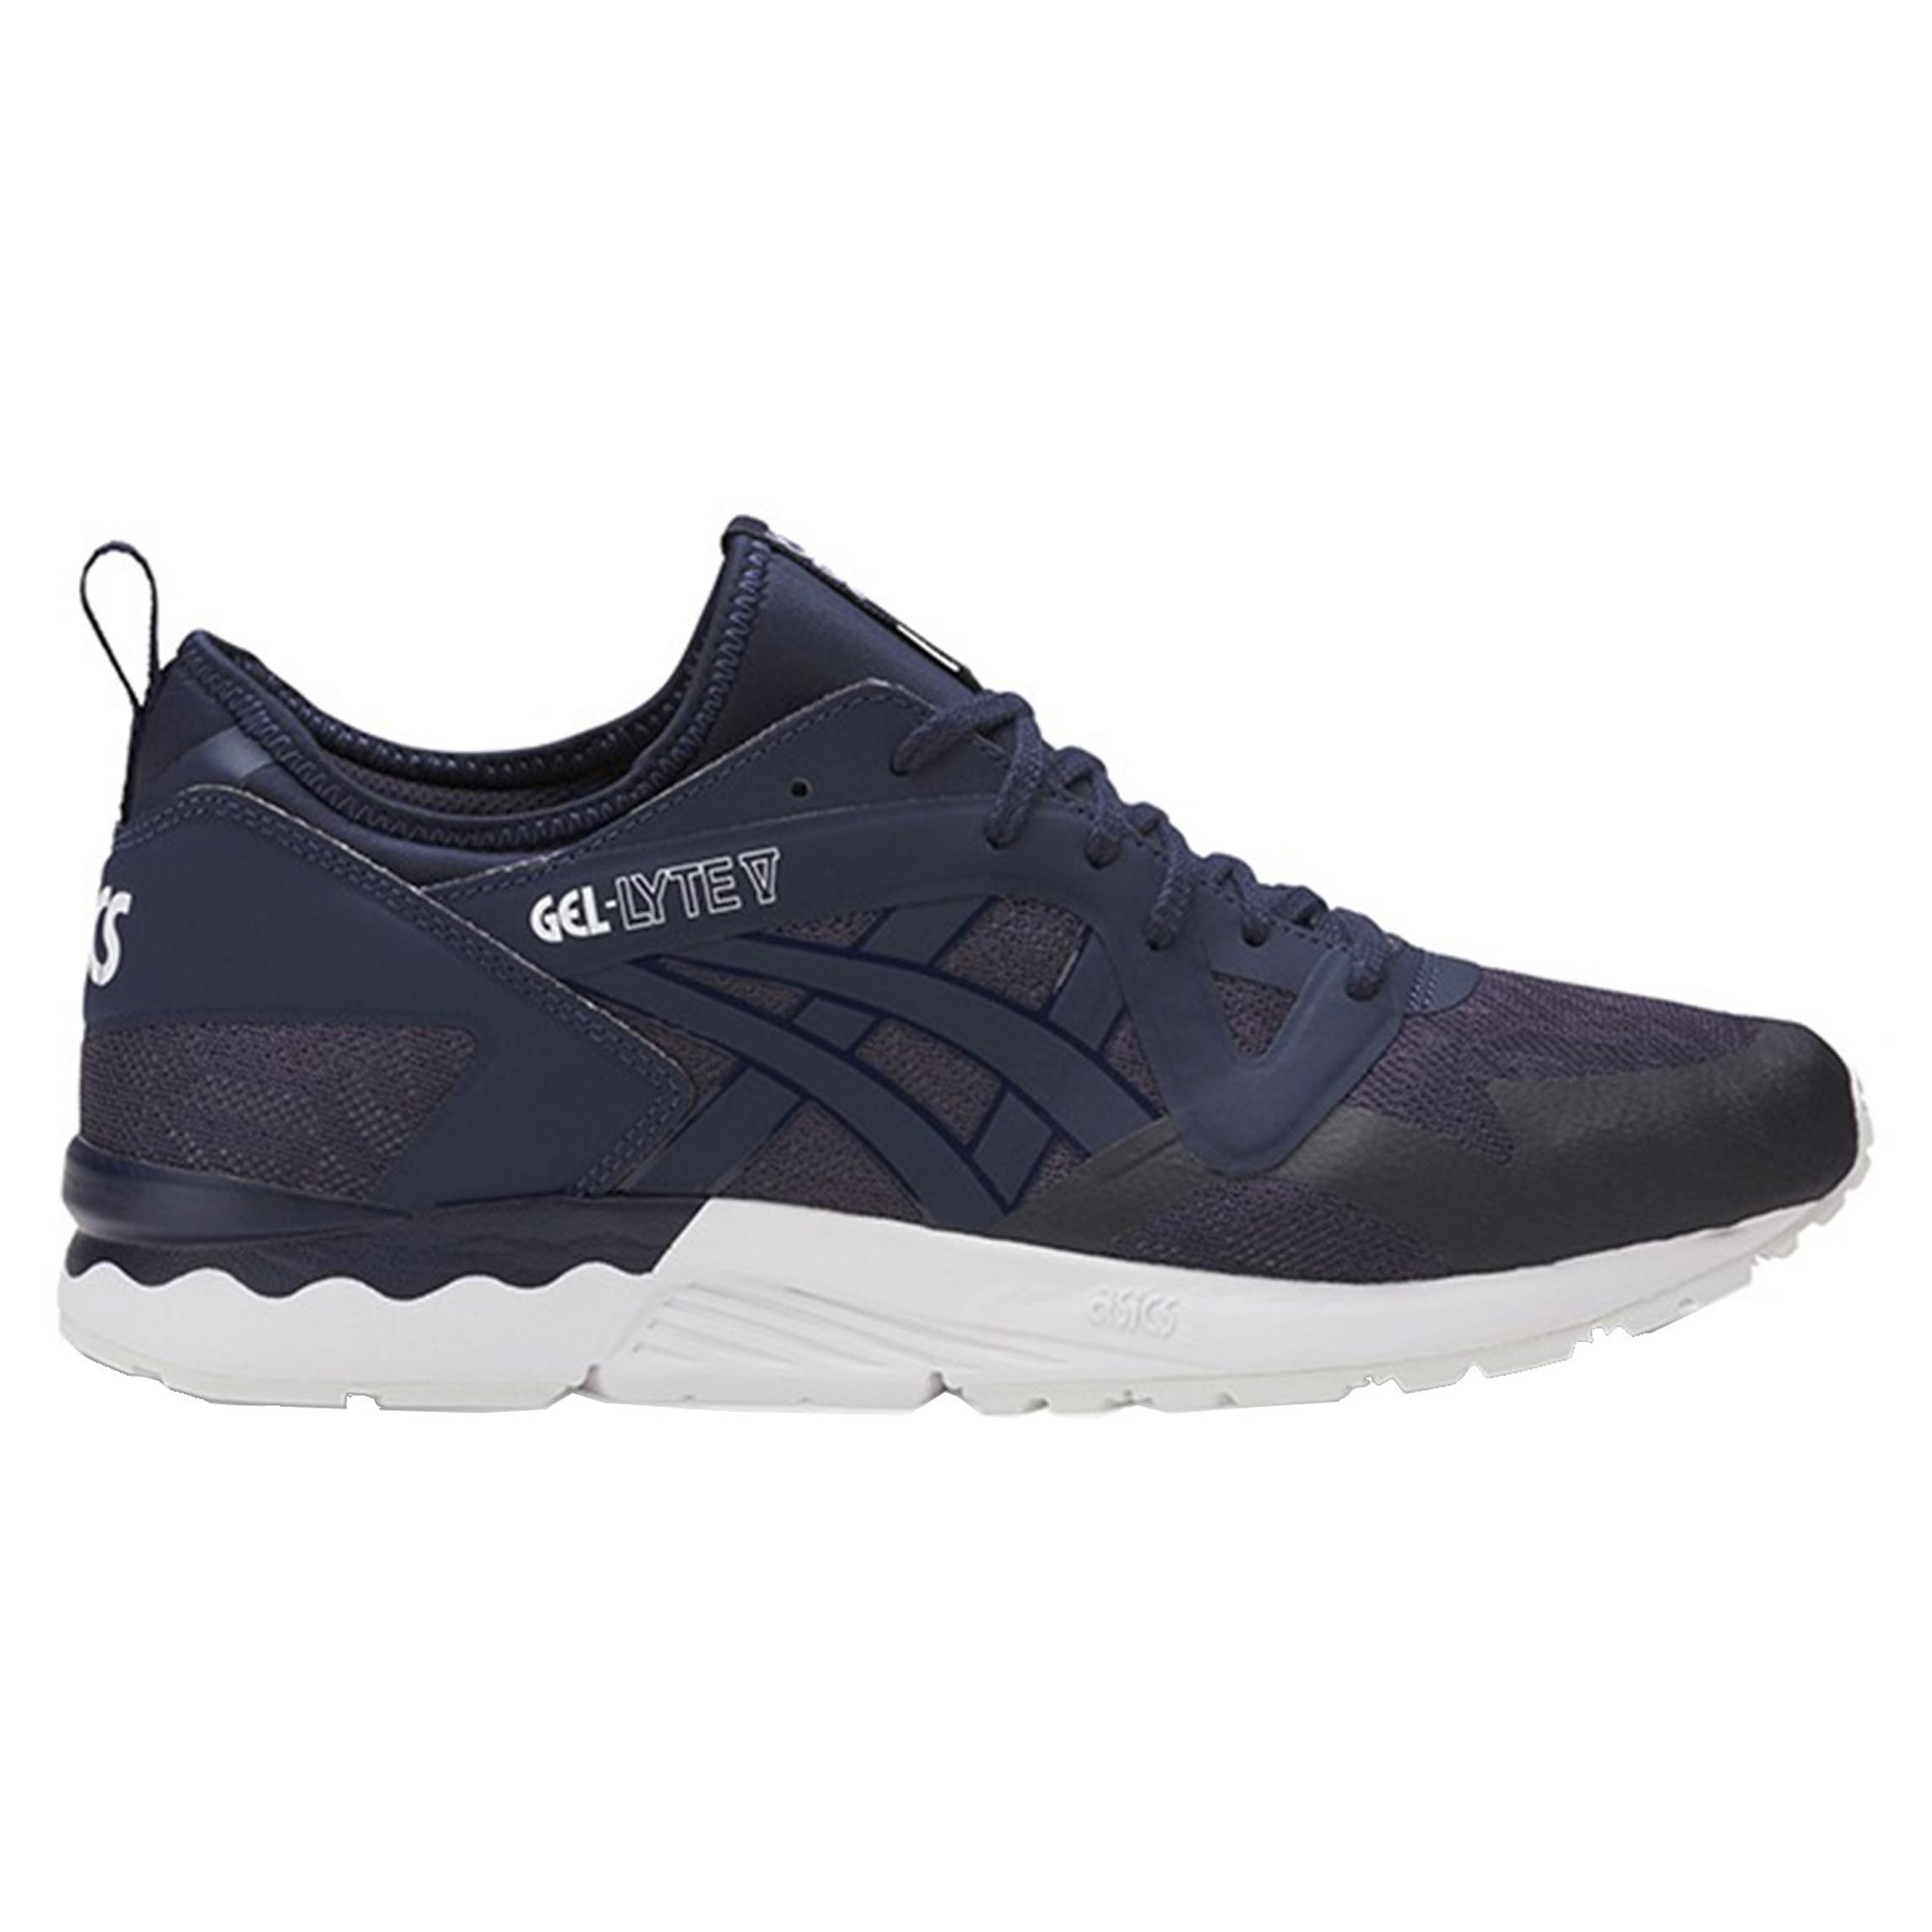 کفش دویدن بندی مردانه GEL-LYTE V NS - اسیکس